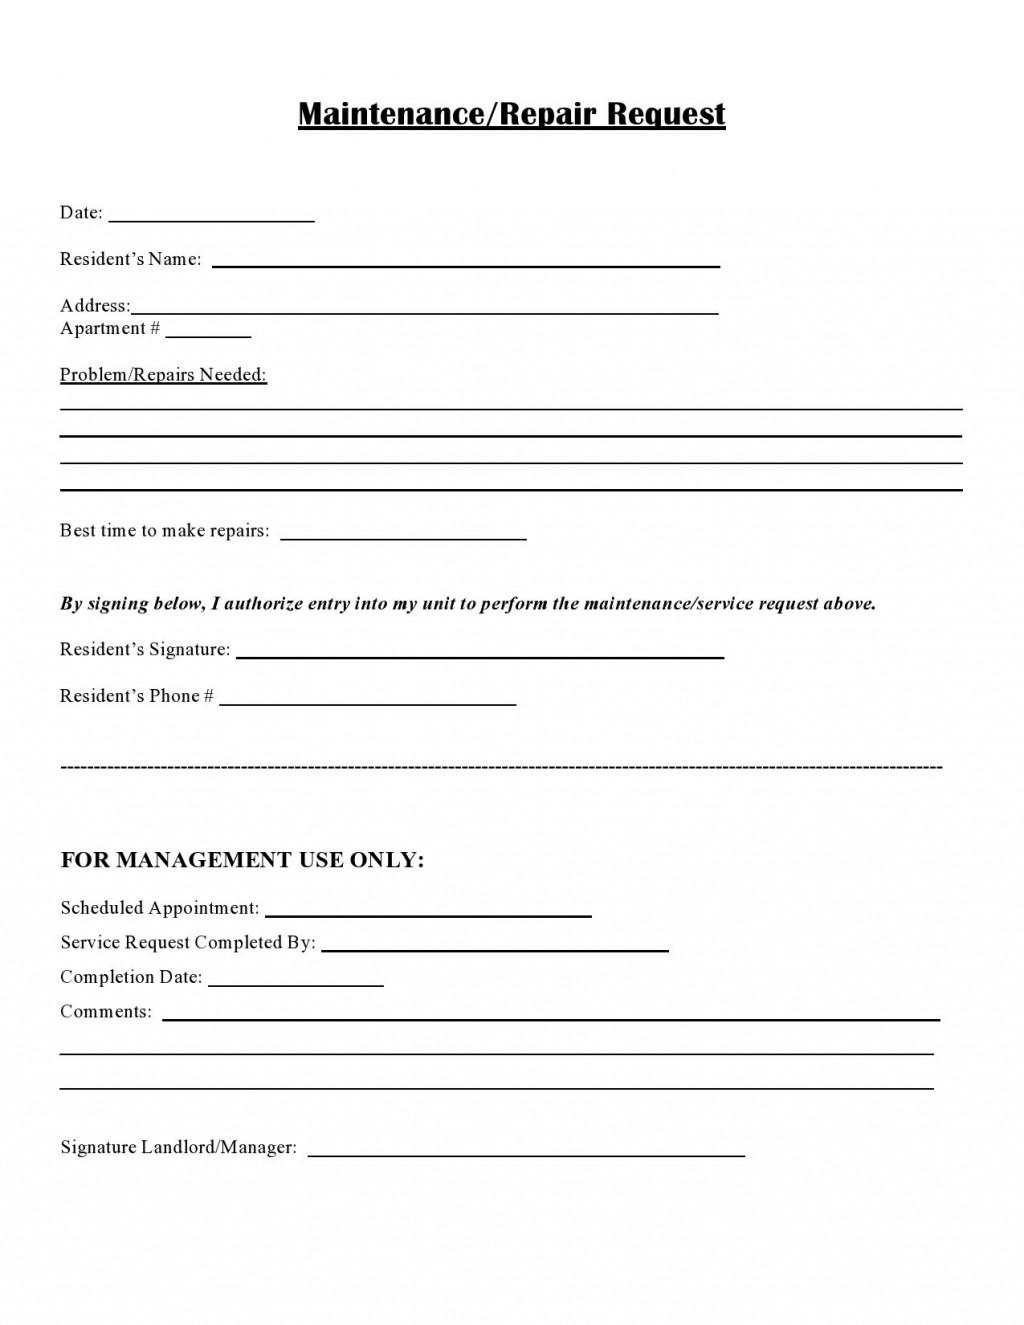 007 Outstanding Maintenance Work Order Template Sample  Form FreeLarge